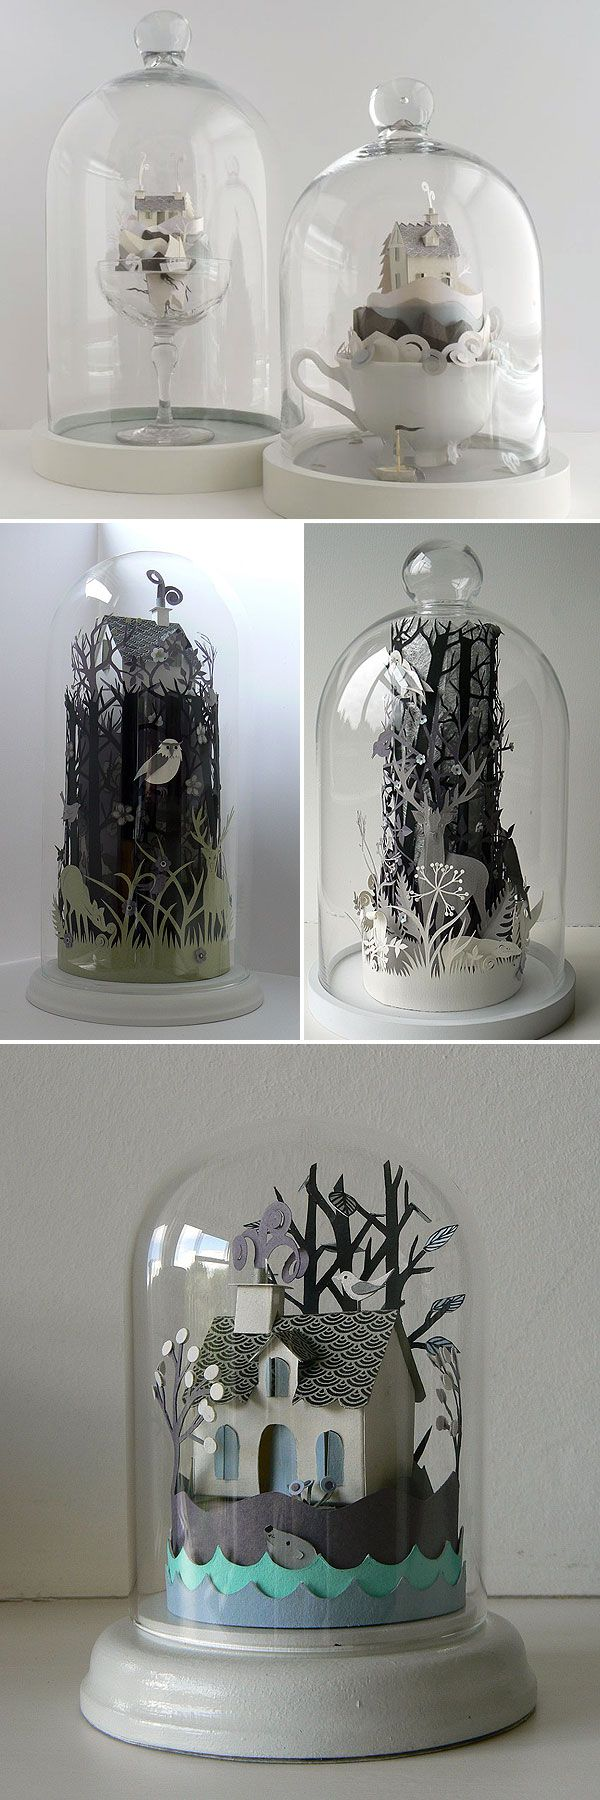 best creatività images on pinterest bricolage creative ideas